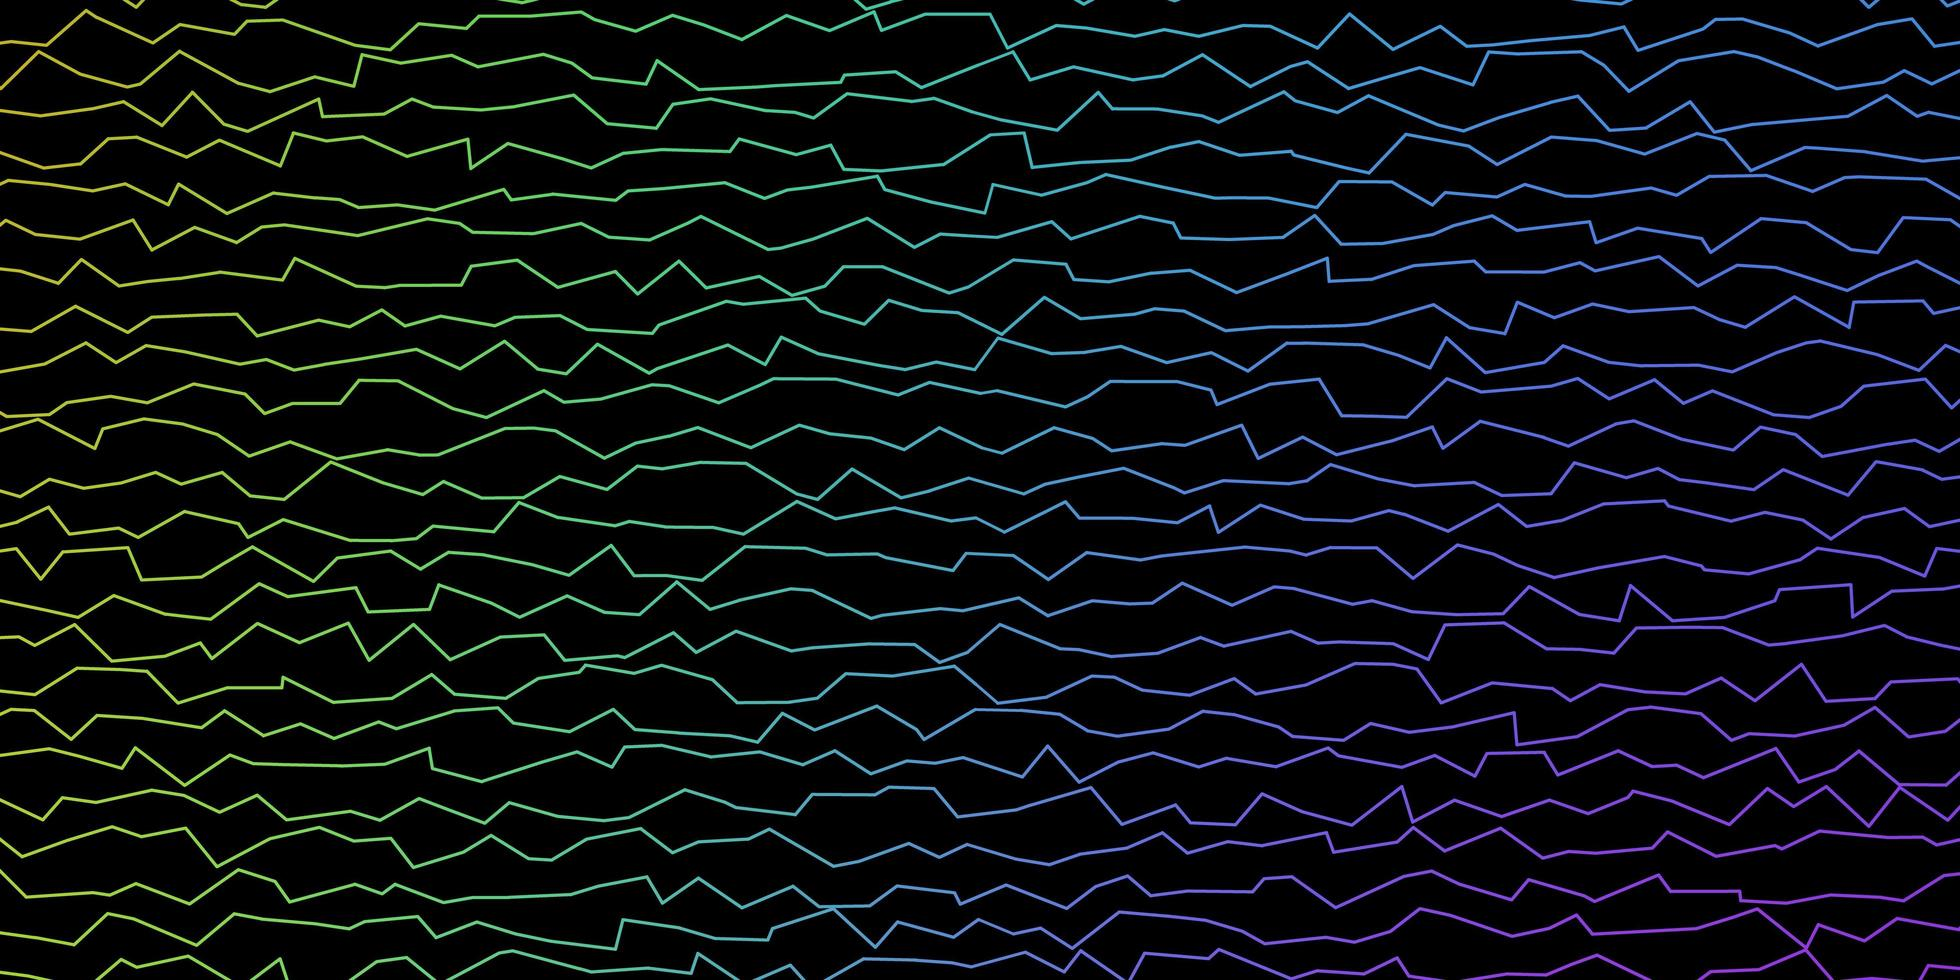 dunkles mehrfarbiges Vektormuster mit gekrümmten Linien. vektor